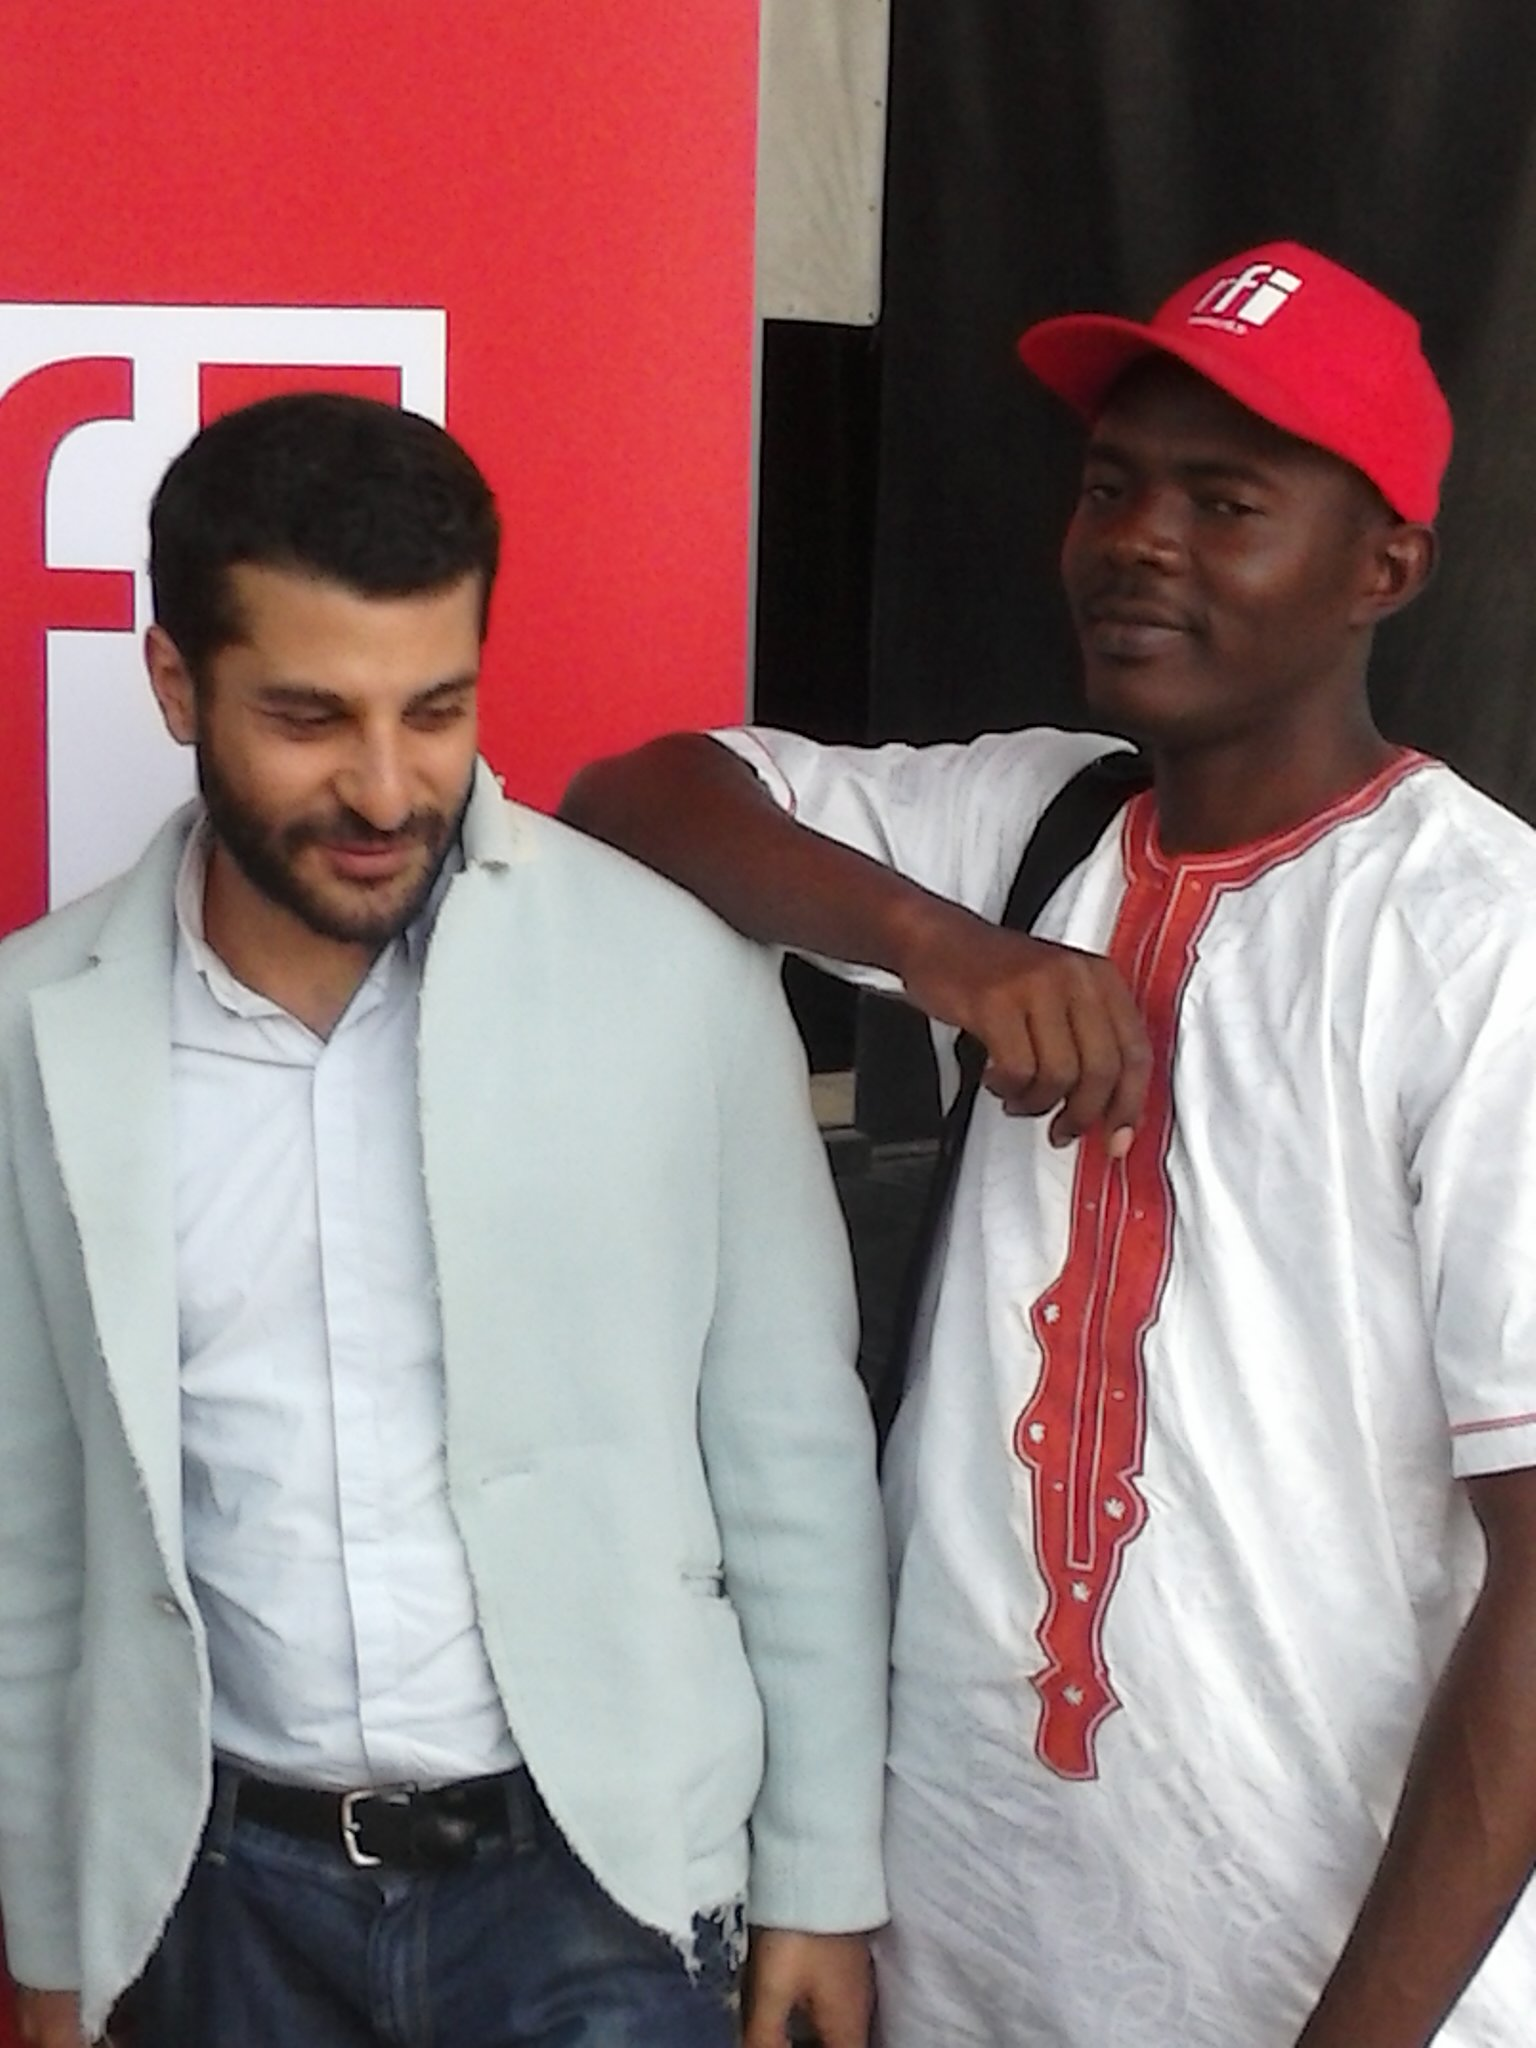 Fofana et Ziad Maalouf (Atelier des médias RFI)